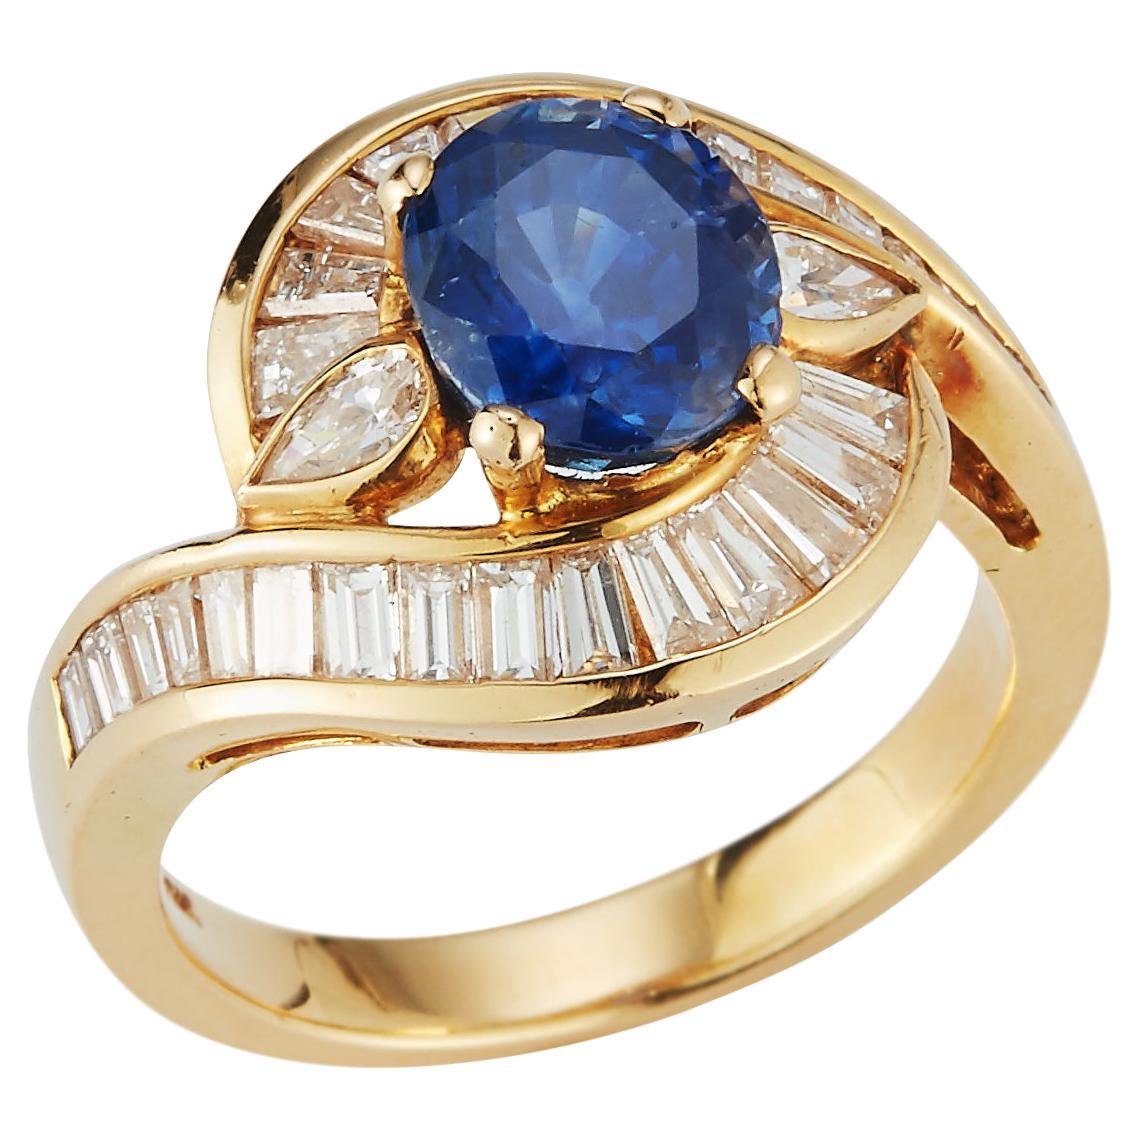 Oval Cut Sapphire & Diamond Cocktail Ring